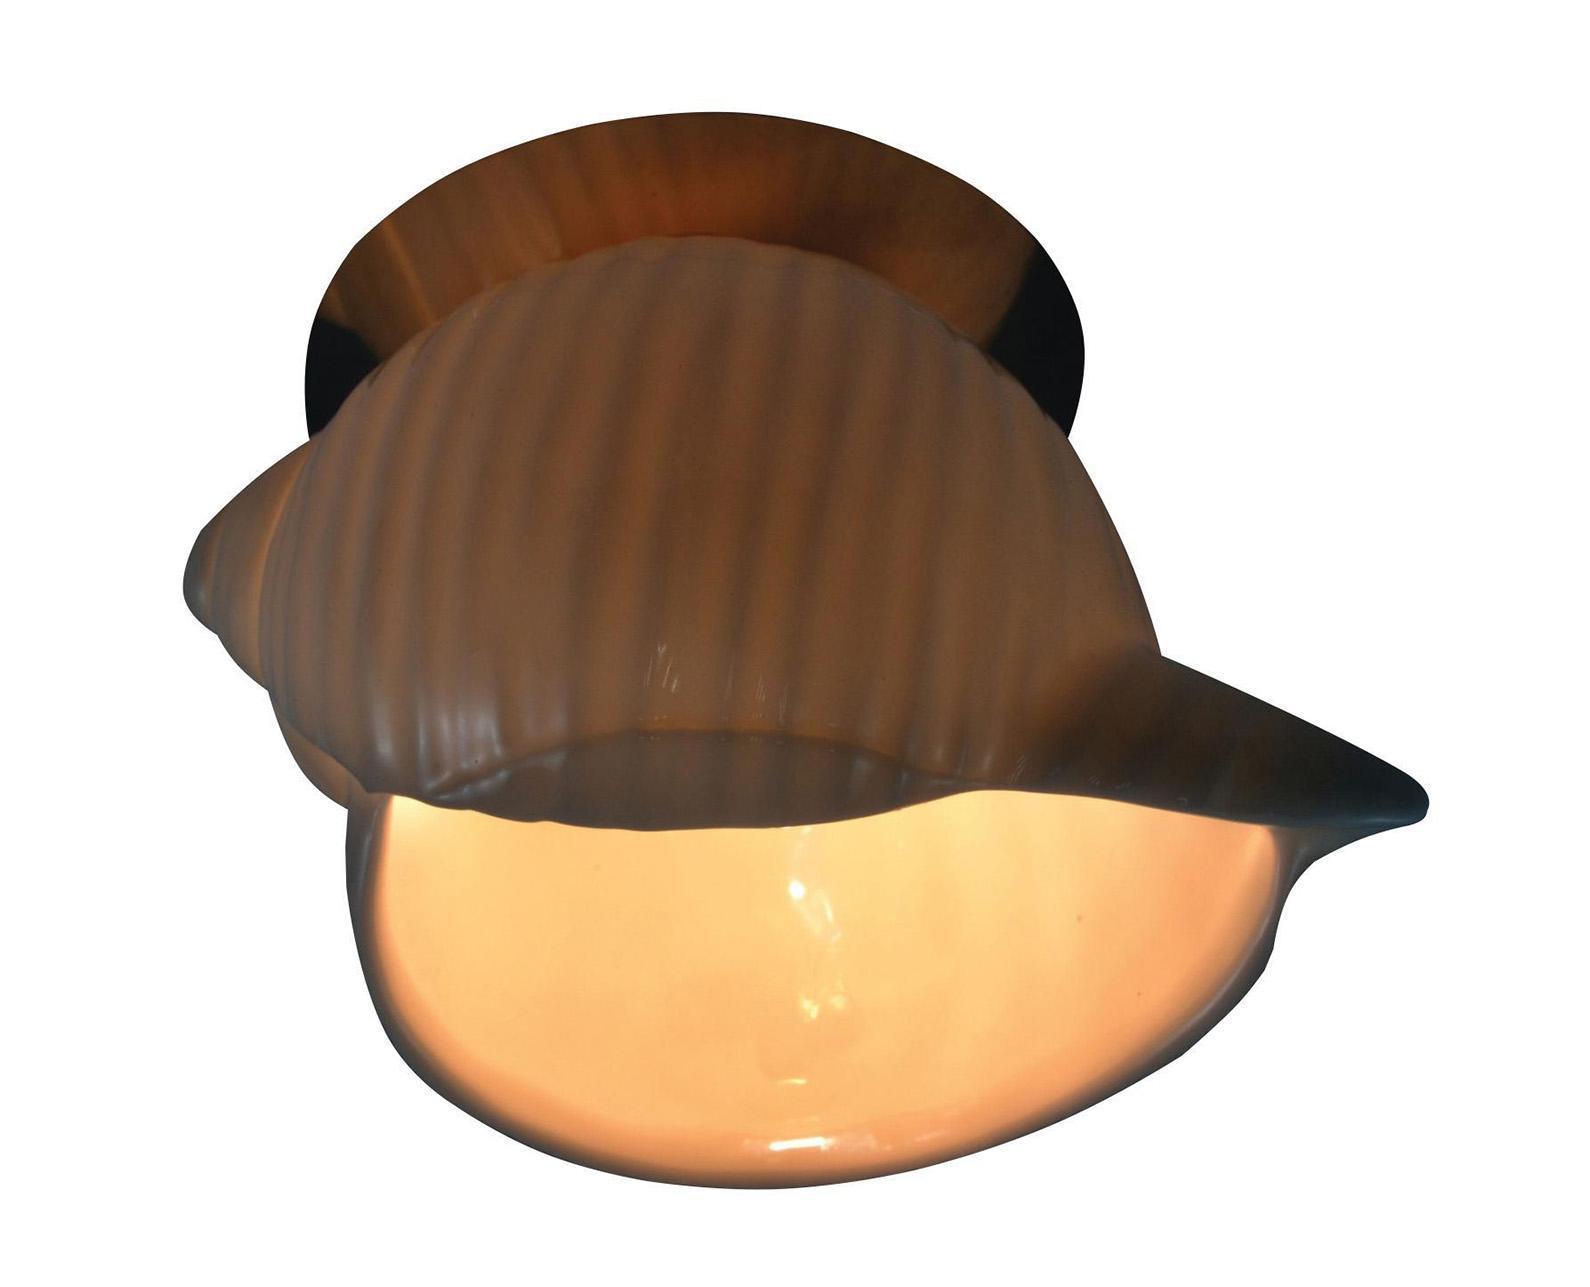 A8805PL-1WH COOL ICE Встраиваемый светильникA8805PL-1WH1xG9x50W Материал: Арматура: Сталь / Элемент декора: Керамика Размер: 110x110x94 Цвет: Белый